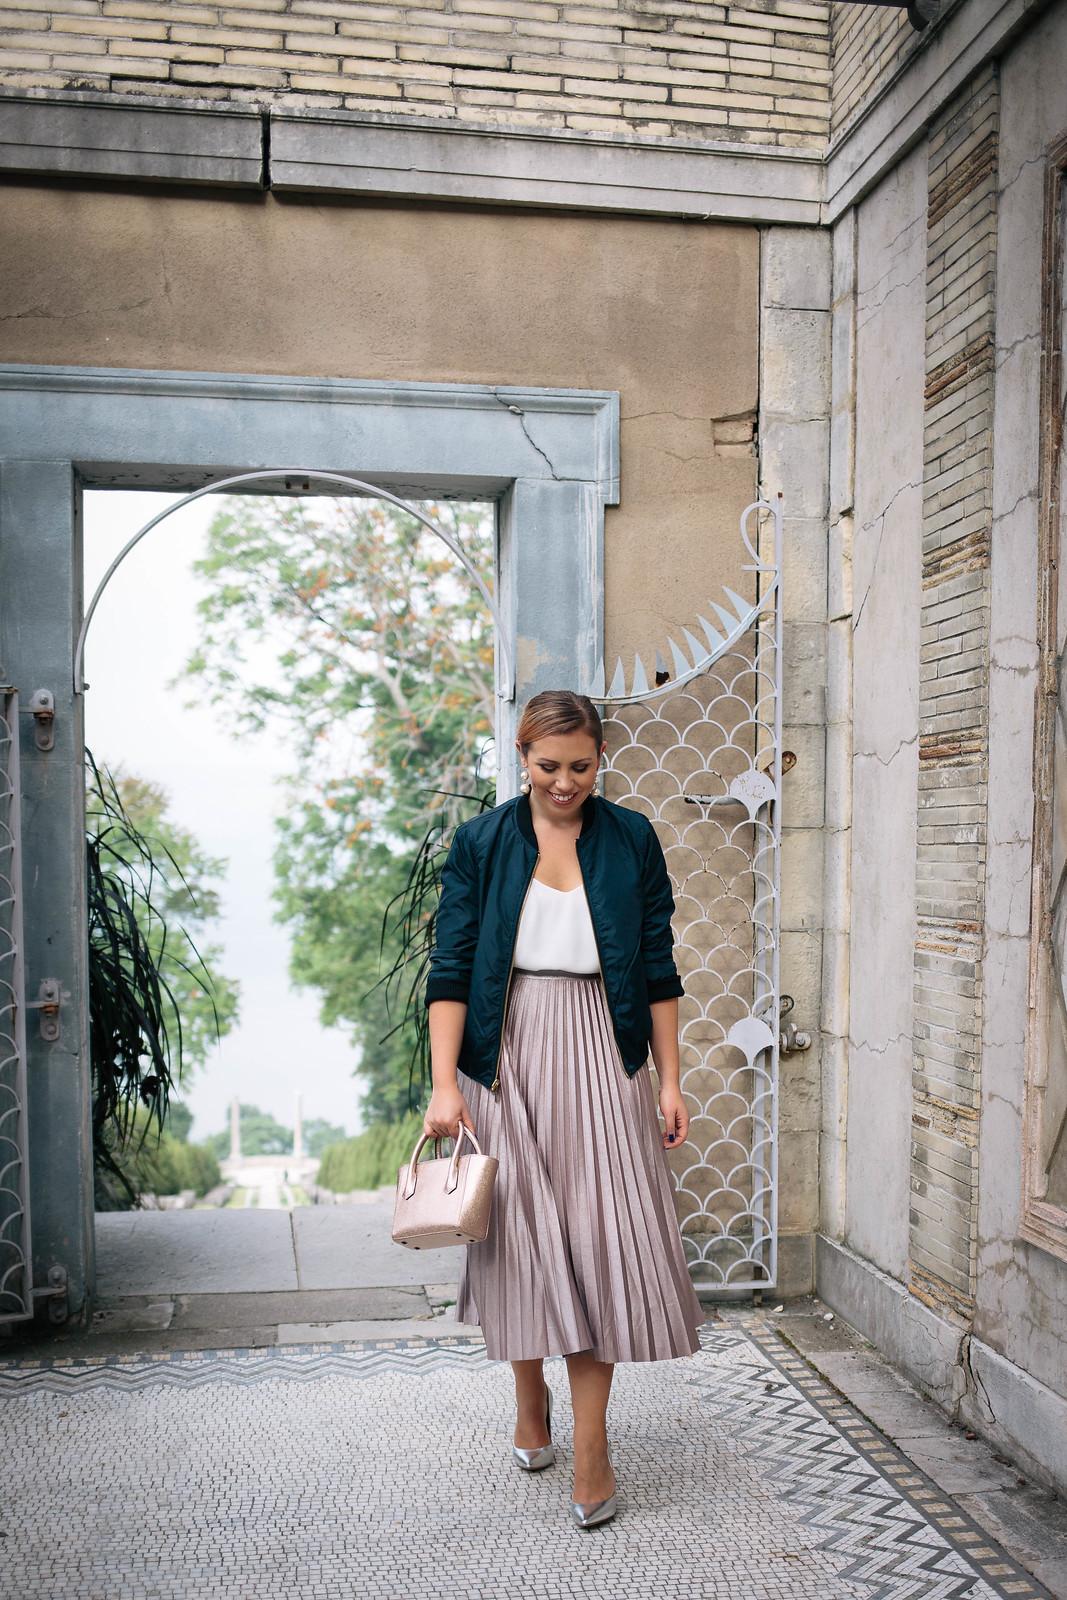 Holiday Outfit Style Jackie Giardina Living After Midnite Fashion Blogger Shiny Midi Skirt Navy Bomber Jacket